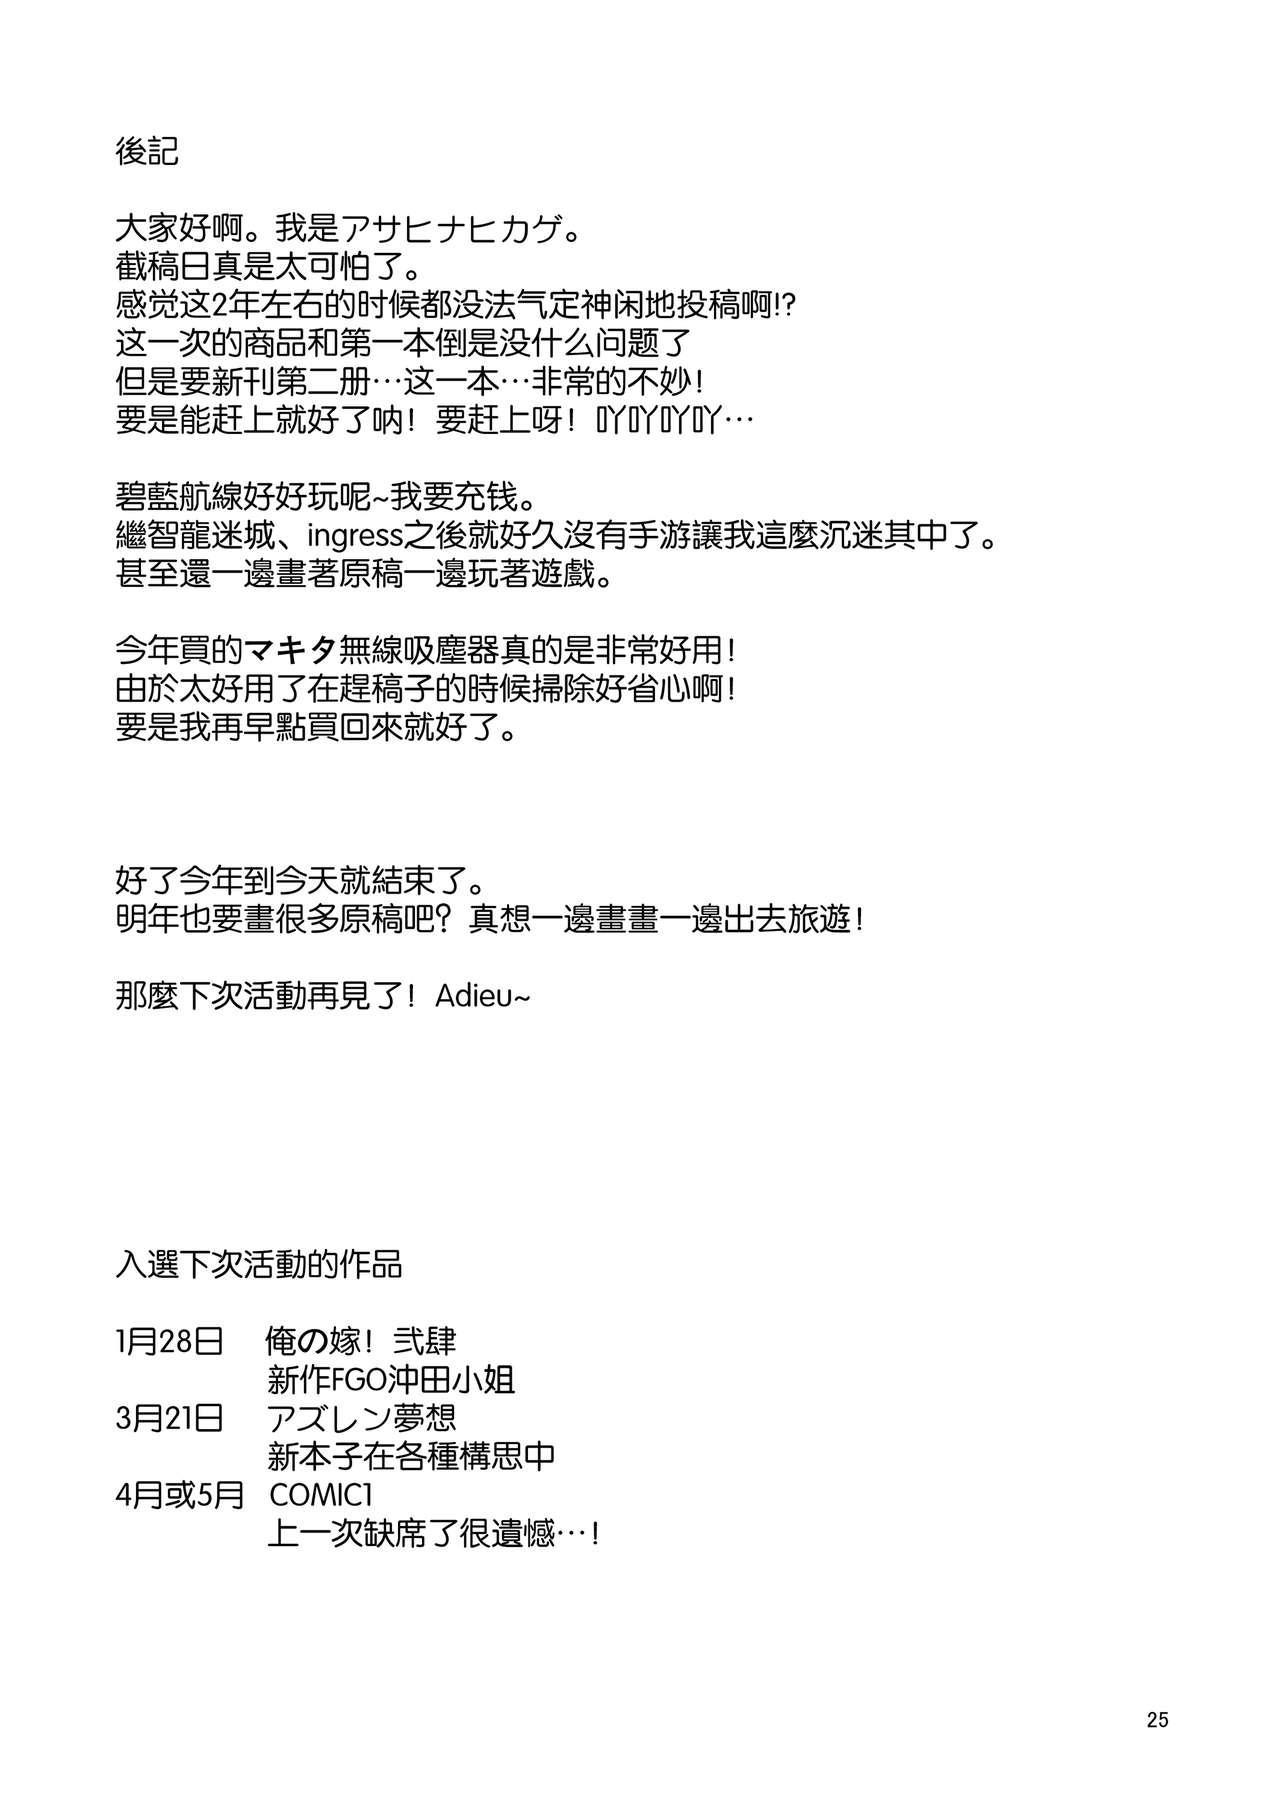 (C93) [Akapenguin (Asahina Hikage)] Atago-san to Takao-san (Azur lane) [Chinese] [無邪気漢化組] 24